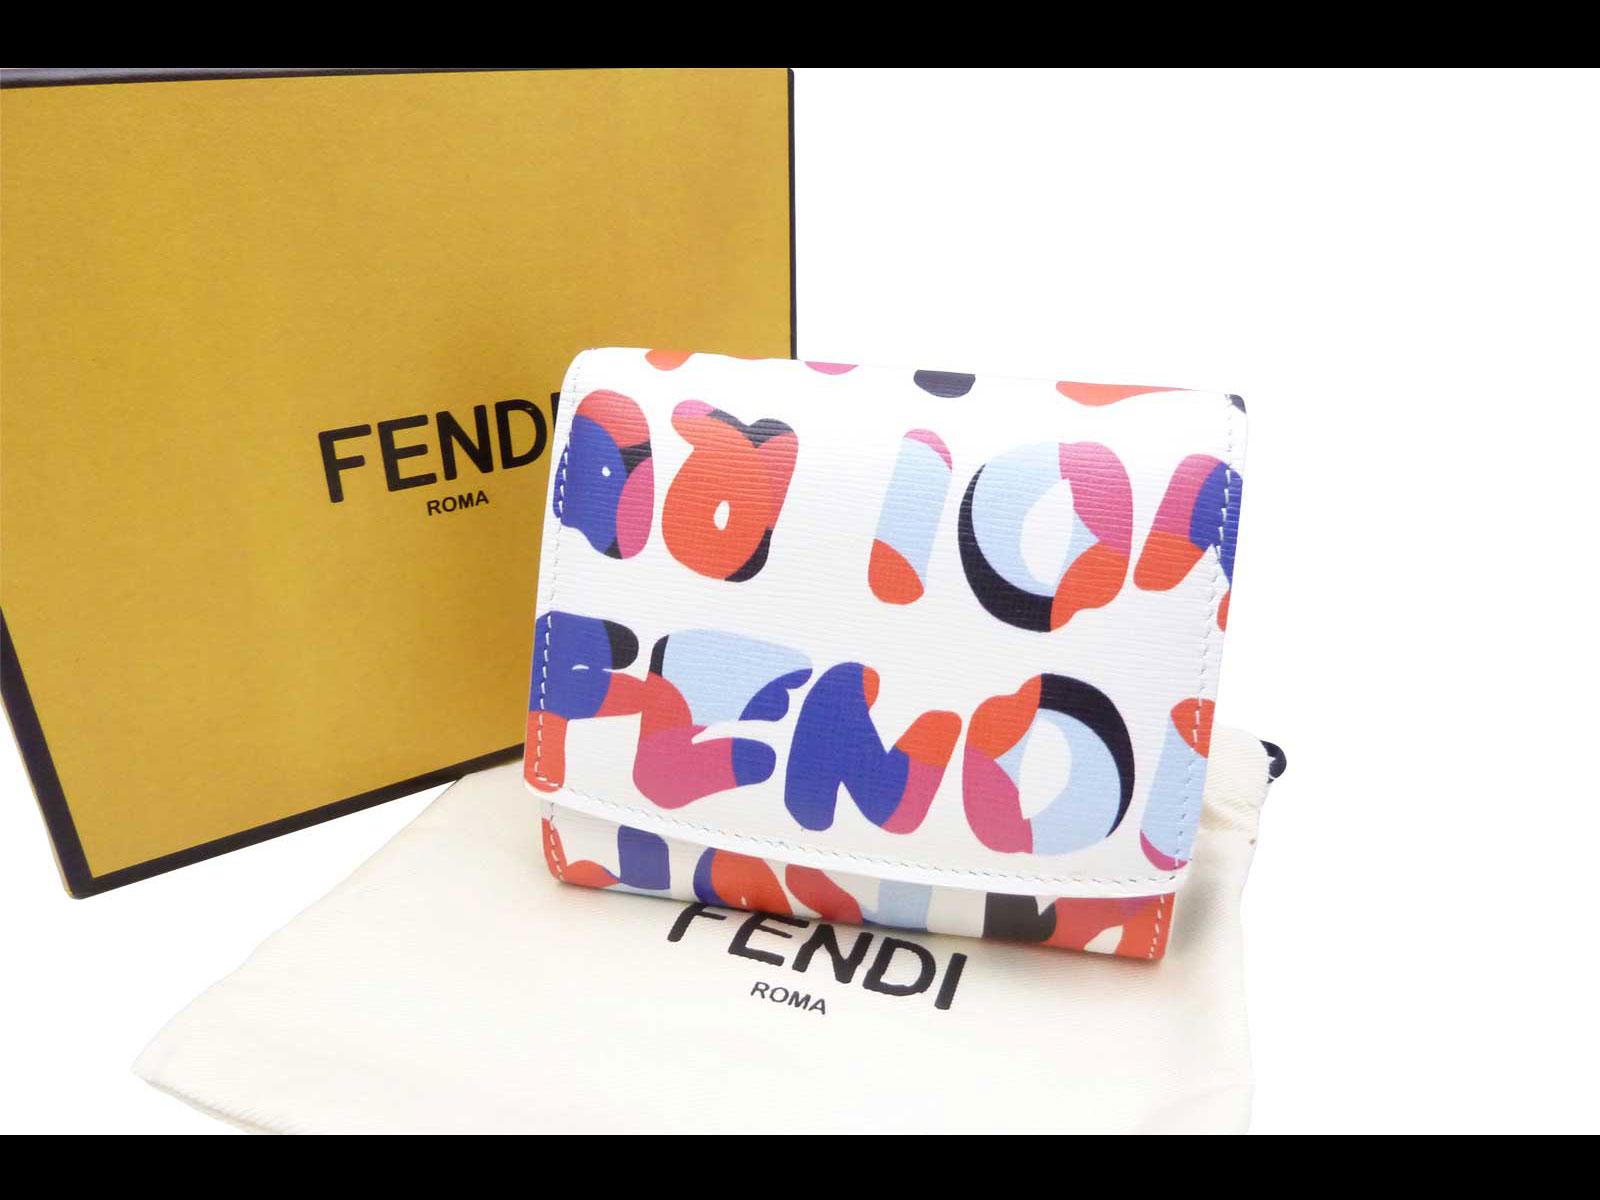 fendi crayon wallet n9eu  Fendi by FENDI purse CRAYONS Fendi Roma  multicolor leather  featured two  fold wallet